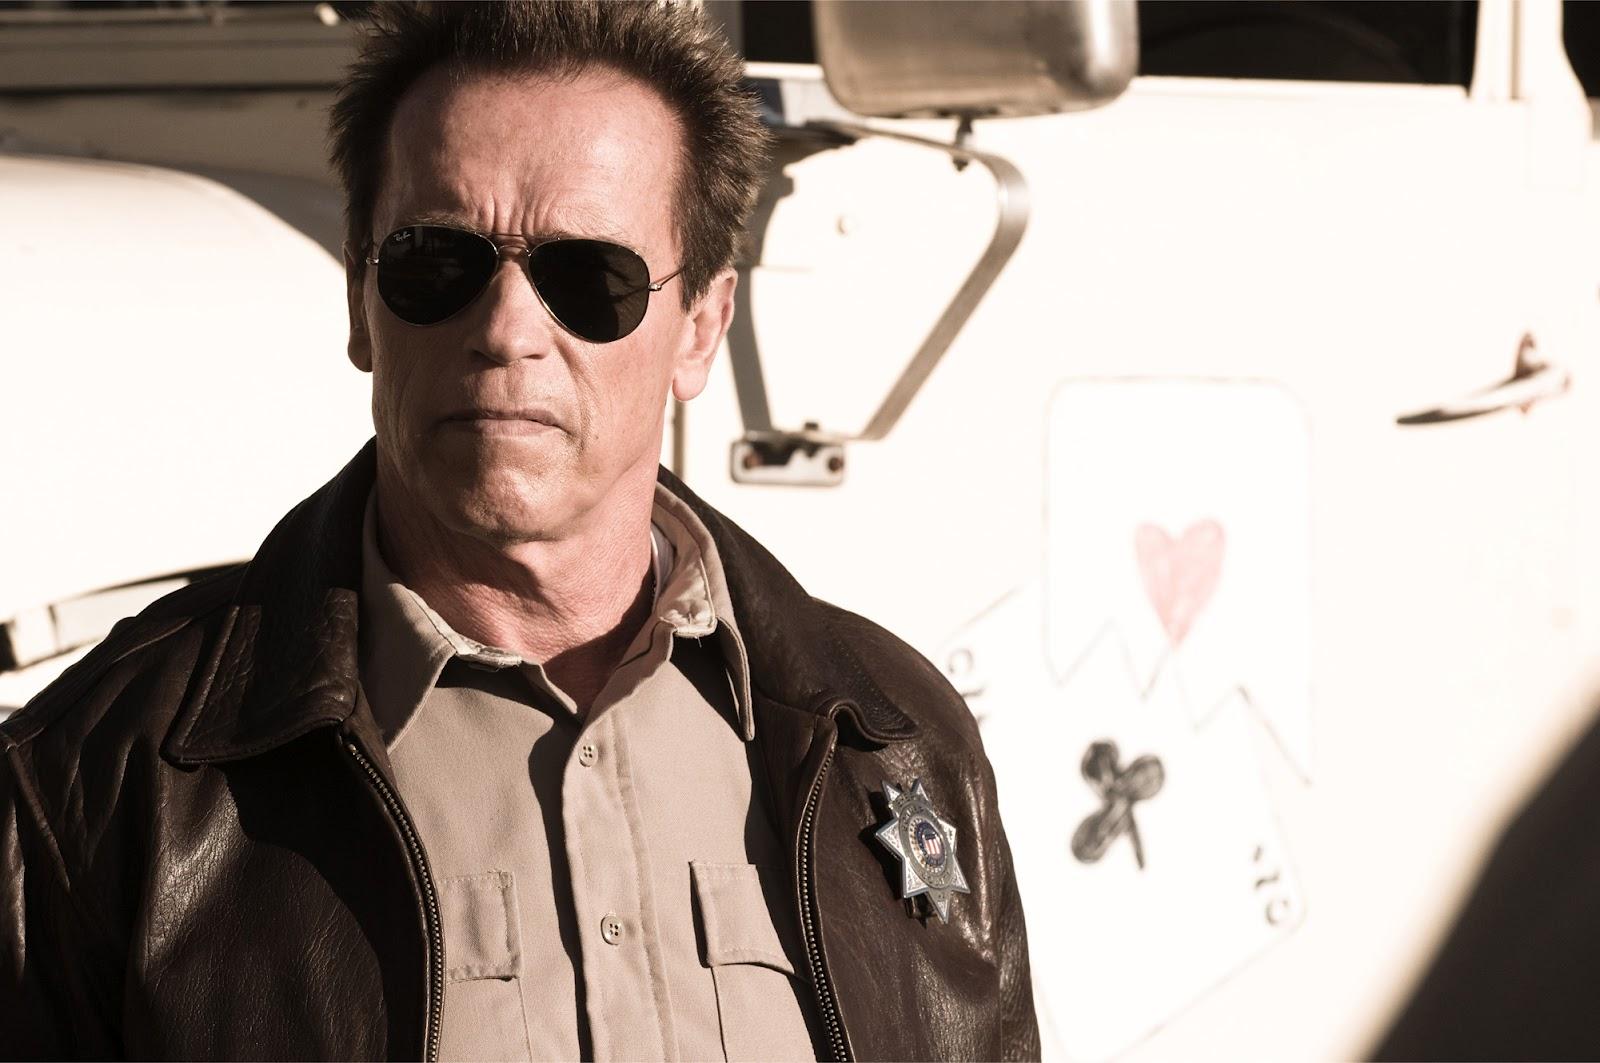 http://4.bp.blogspot.com/-HLNT2HmHK1U/UC1xLoYu4AI/AAAAAAAA4iI/2ACuhw_B4Go/s1600/Kim_Jee-Woon-The_Last_Stand-Arnold_Schwarzenegger.jpg